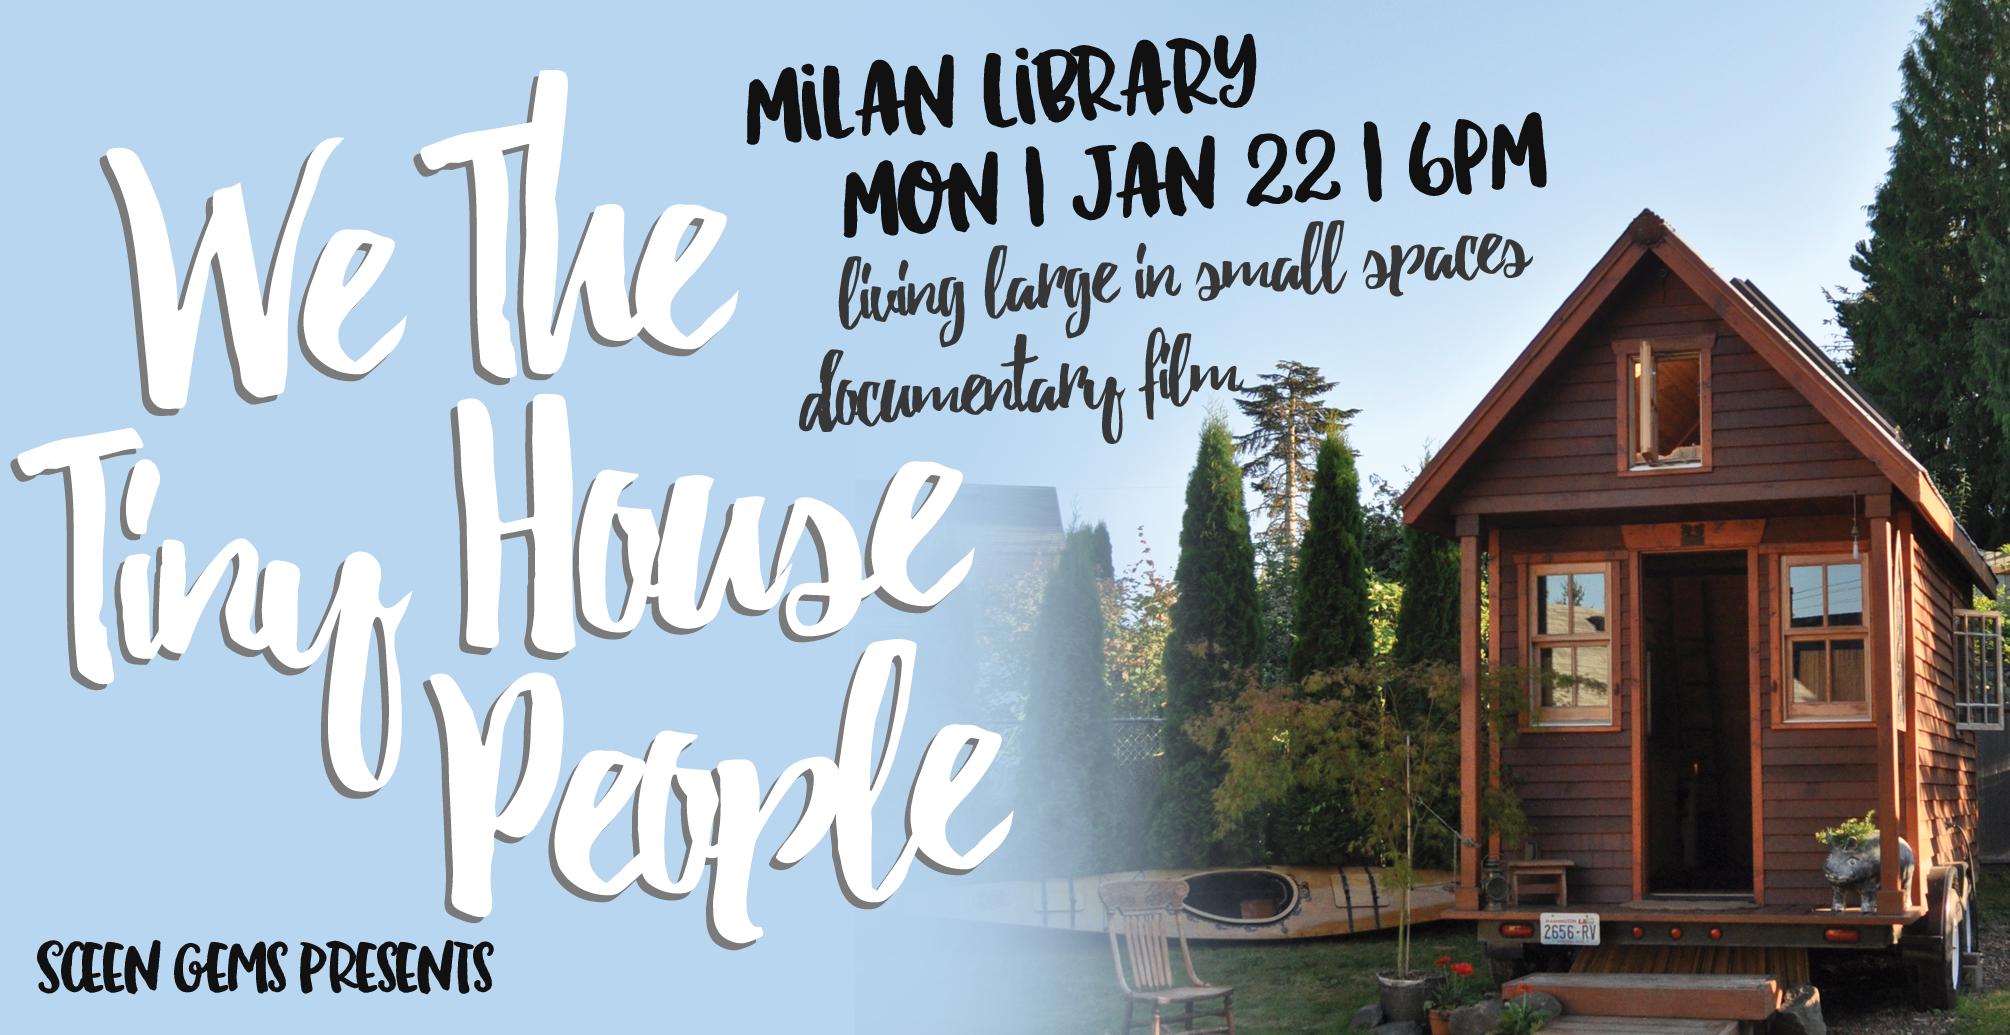 2018-01-ADULT-Milan-Tiny-Houses-Slide